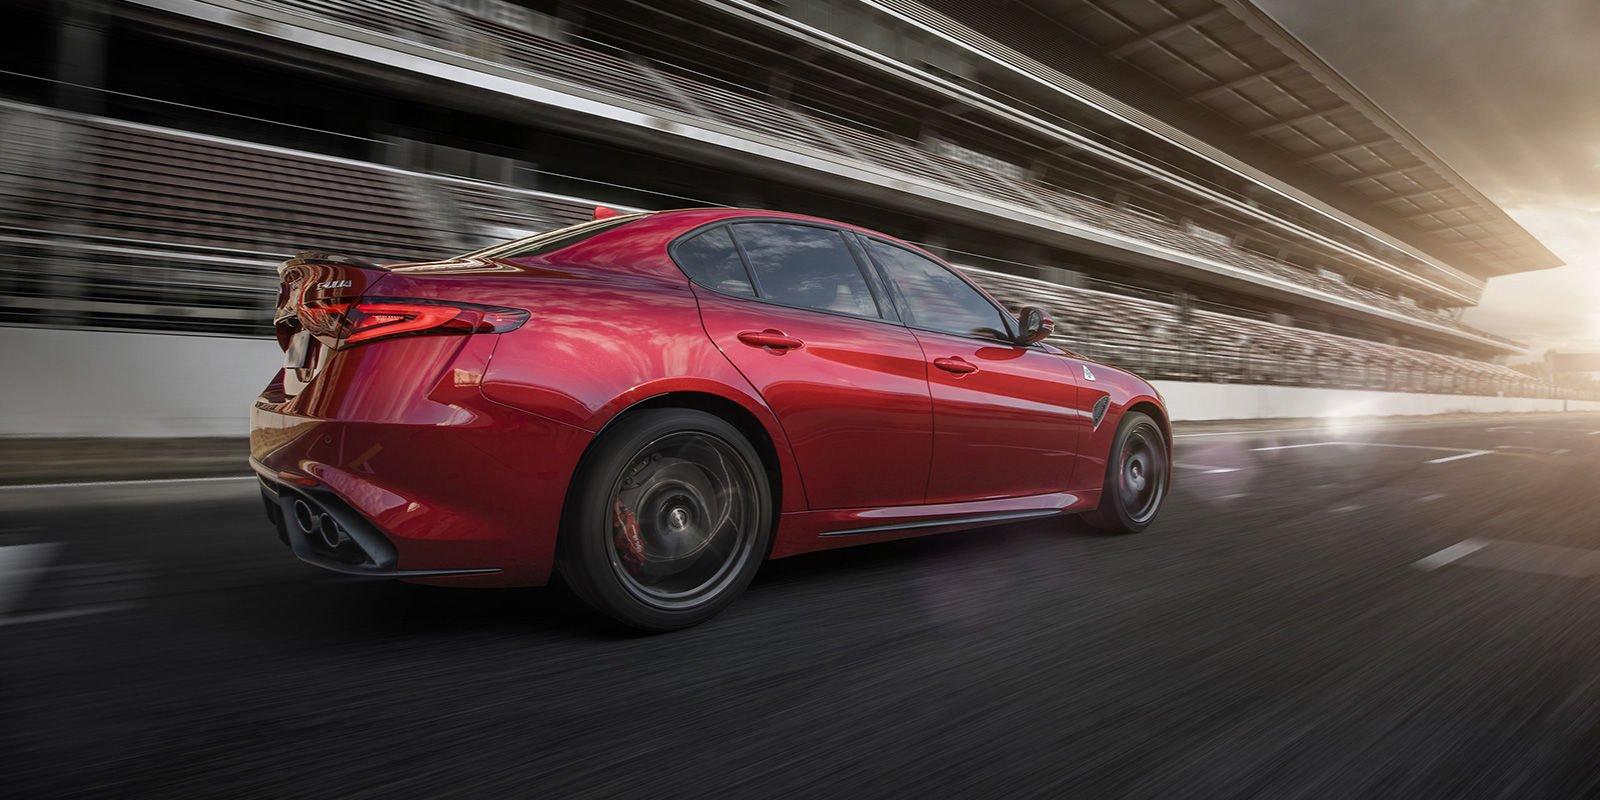 New Alfa Romeo Giulia Quadrifoglio Price Lease Offers Austin TX - Alfa romeo car price